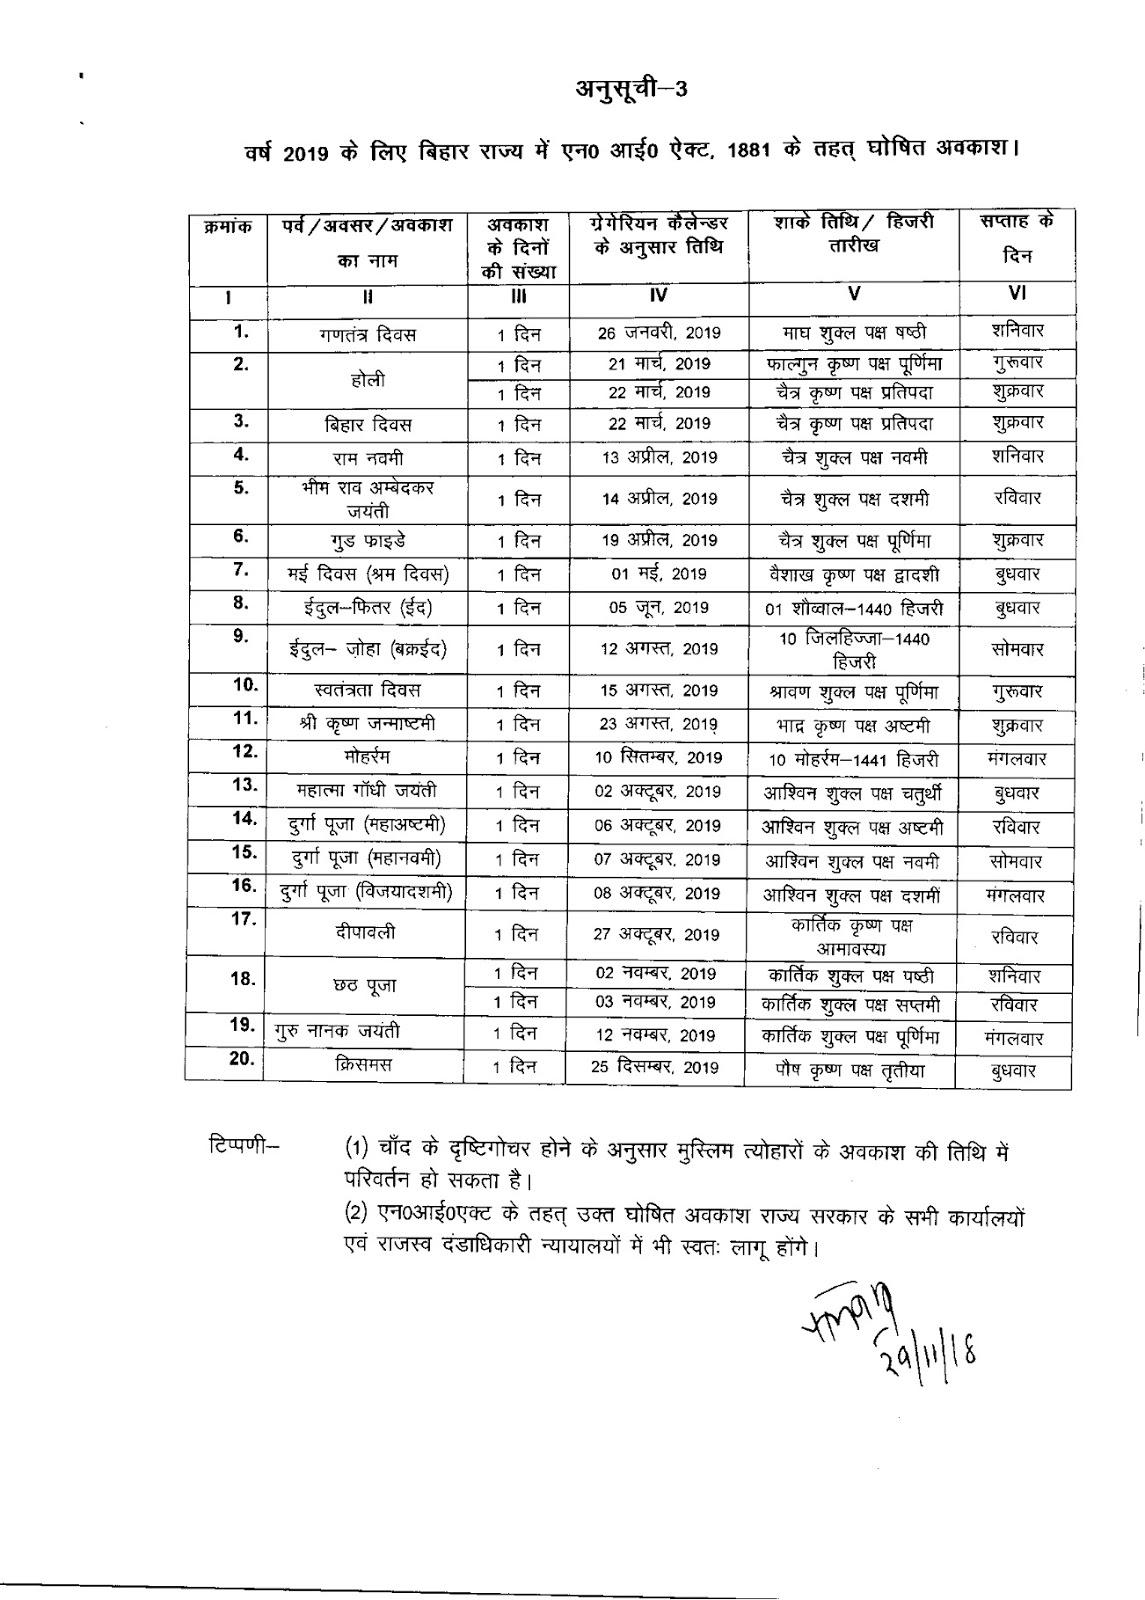 Bihar Government Calendar 2019 regarding Bihar Sarkar Clender